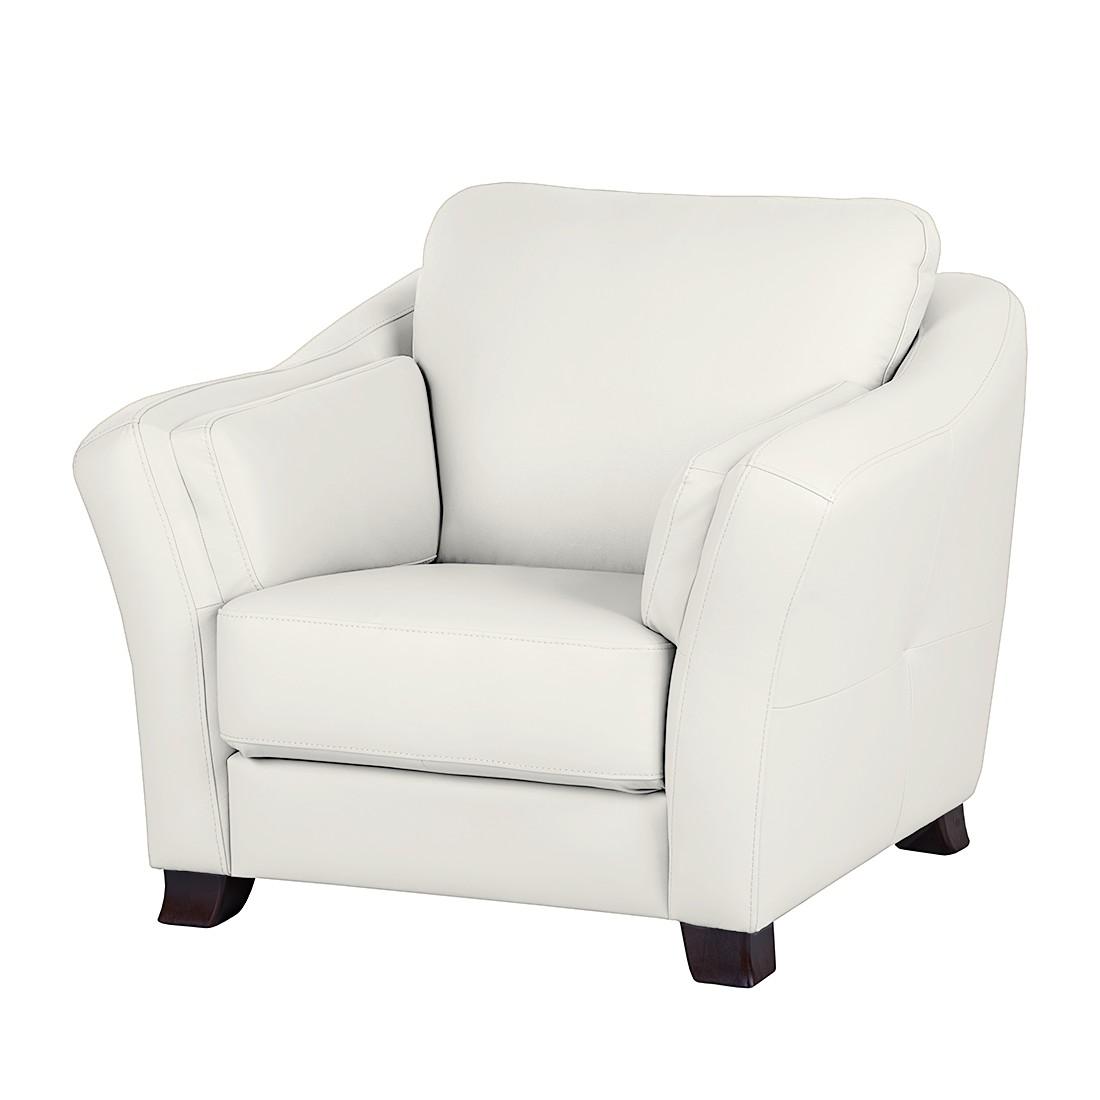 Sessel Toucy – Echtleder Weiß, Nuovoform bestellen